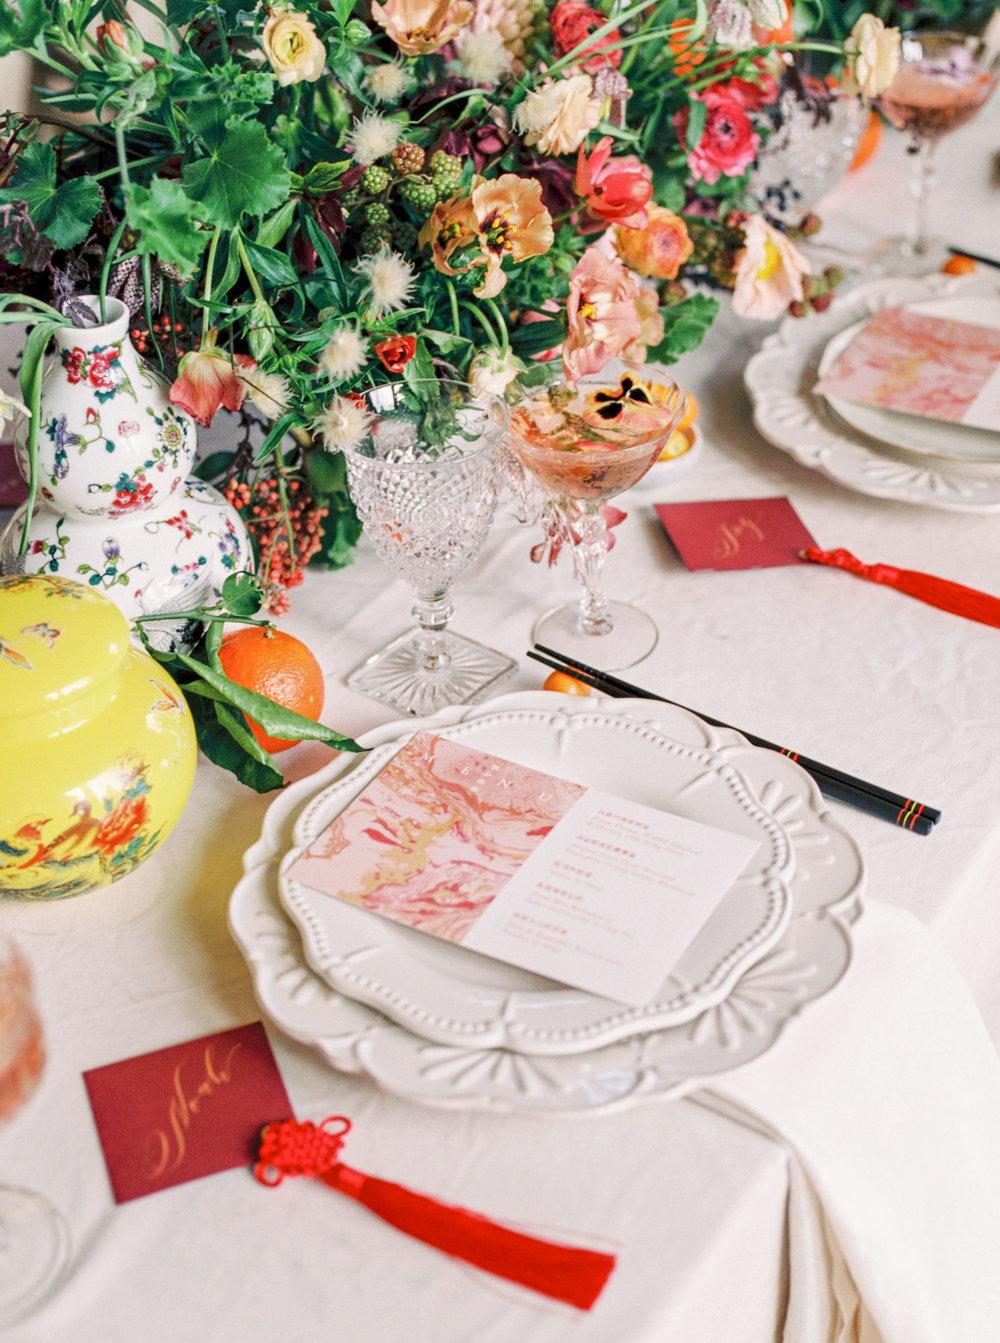 Carlos-Hernandez-Wedding-Film-Photography-Chinese-Year-Celebration-With-Joy-Proctor-079.jpg